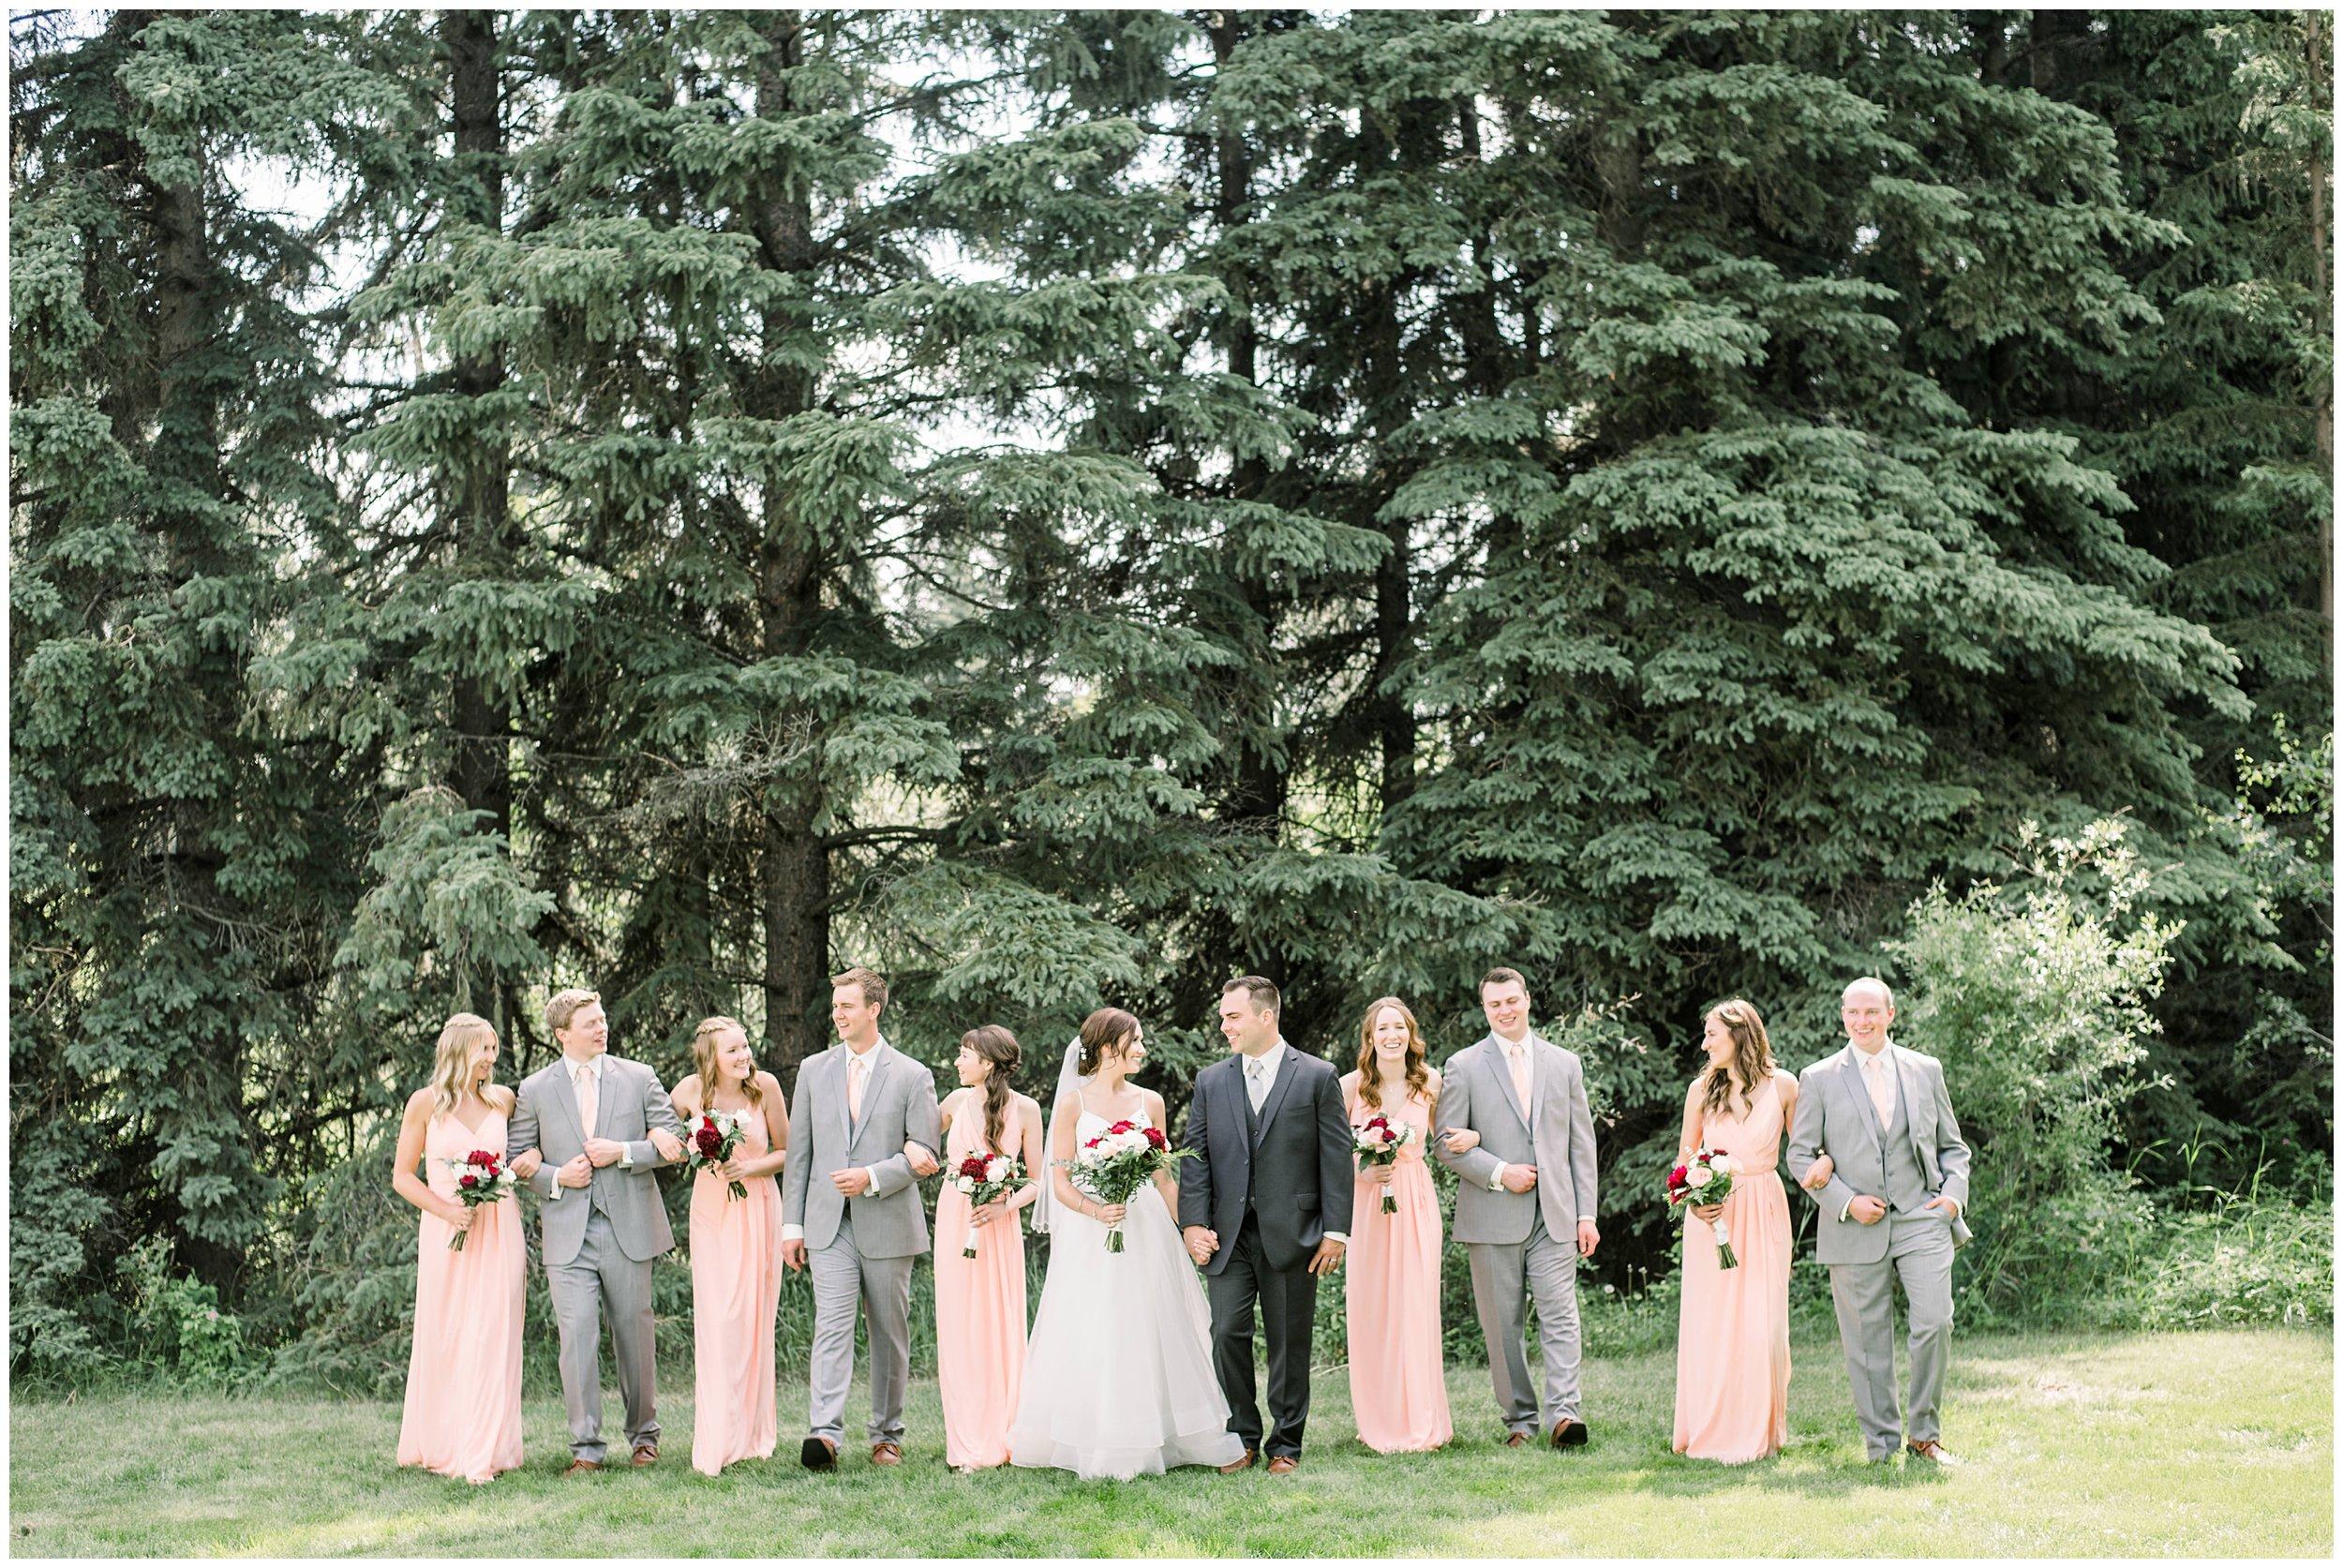 Alyssa-Poland-Photography_0621_alberta wedding.jpg